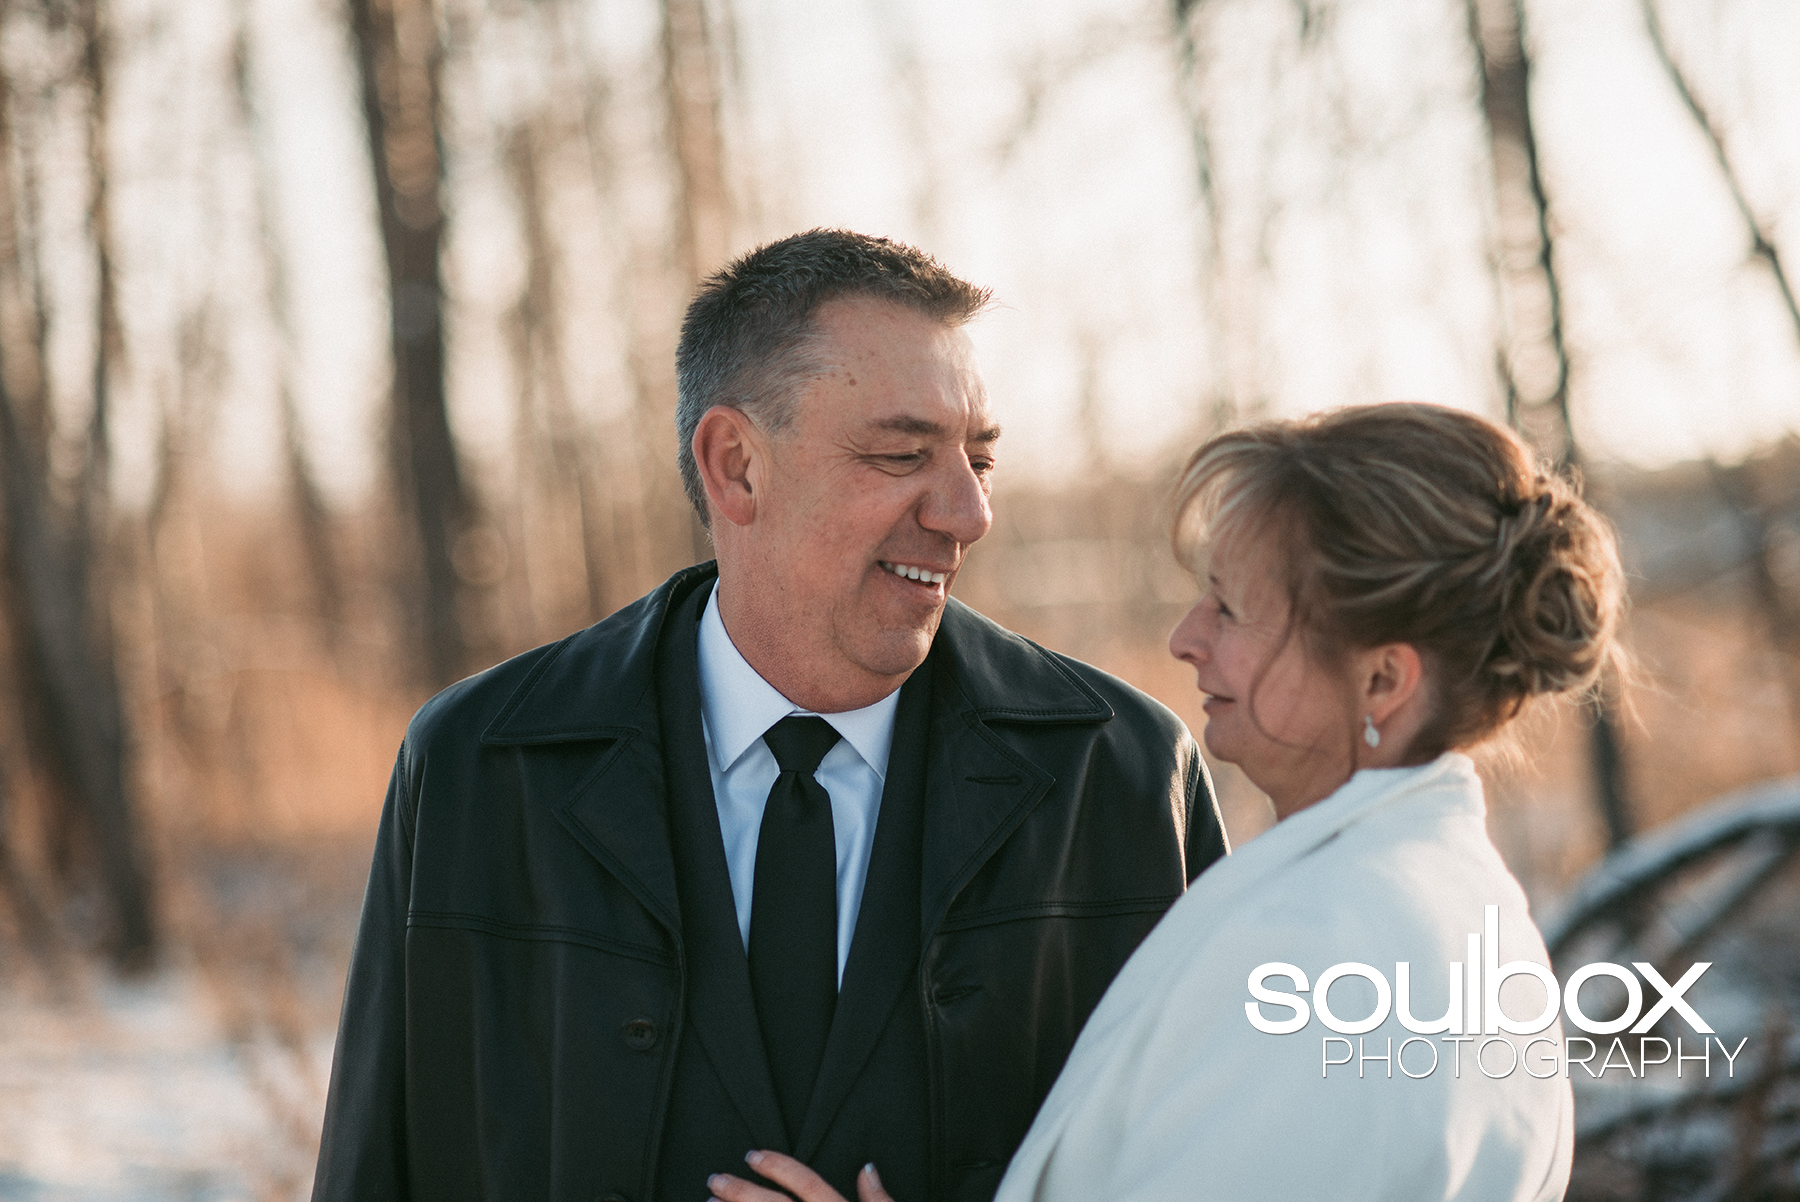 SoulboxPhotography-WinterWedding-4.jpg